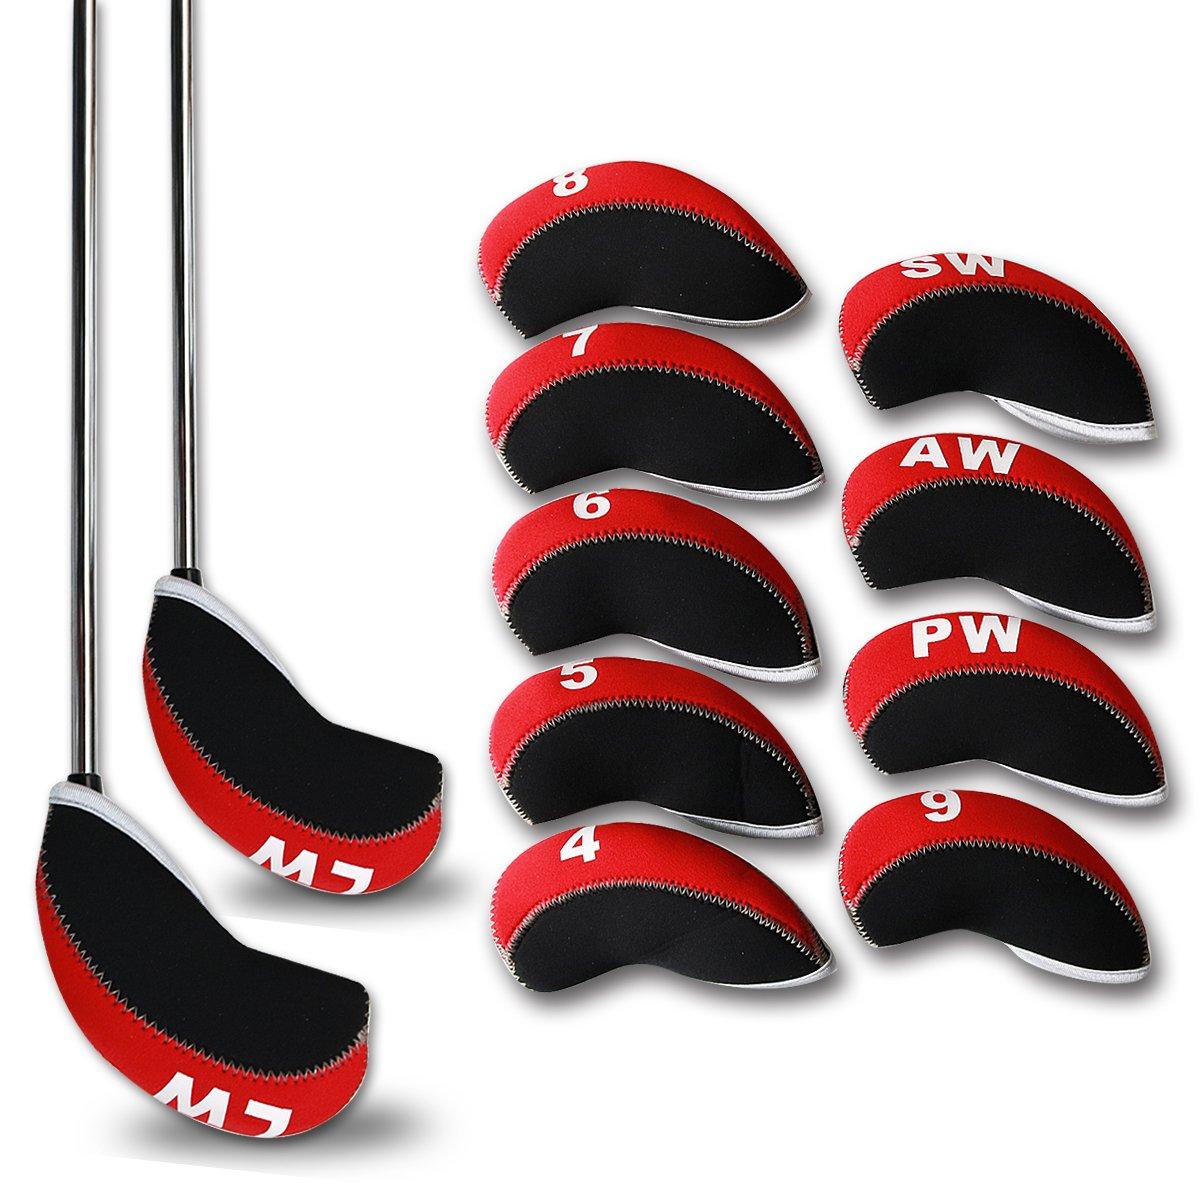 Casar Golf 11PCS 4#-Lw Red & Black Neoprene Golf Iron Covers Headcovers Set For Taylormade Cobra Callaway Mizuno Adams Ping